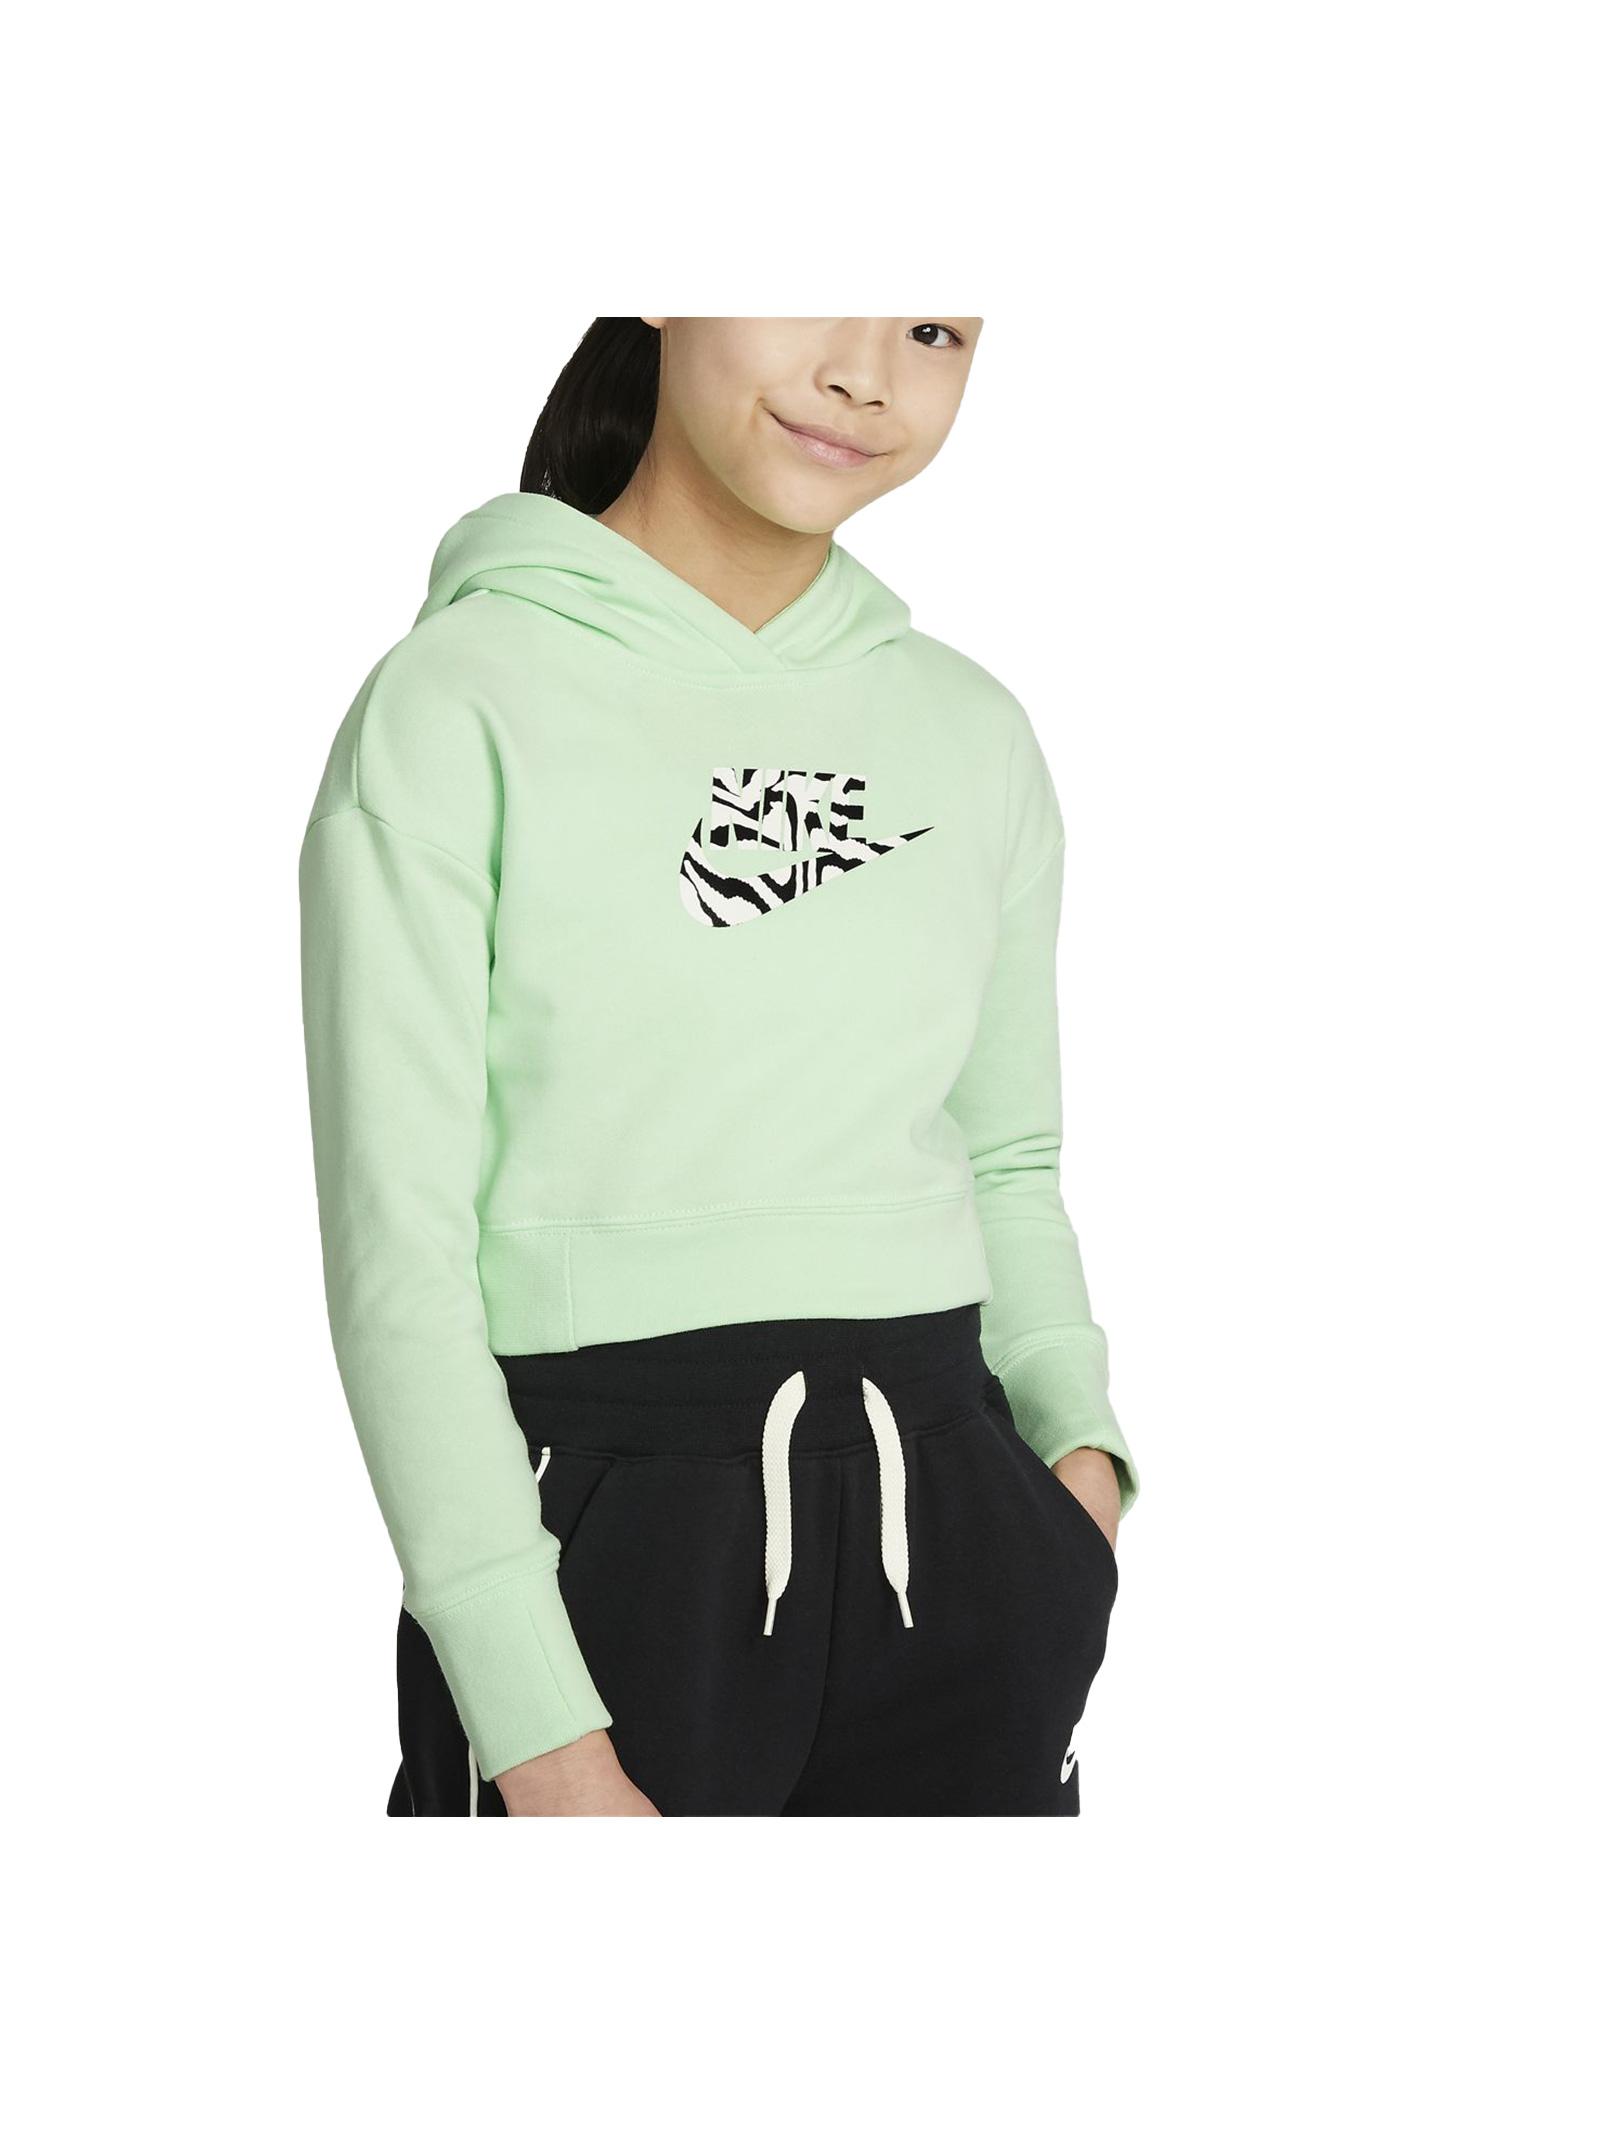 NIKE | Sweatshirts | DC9763-390